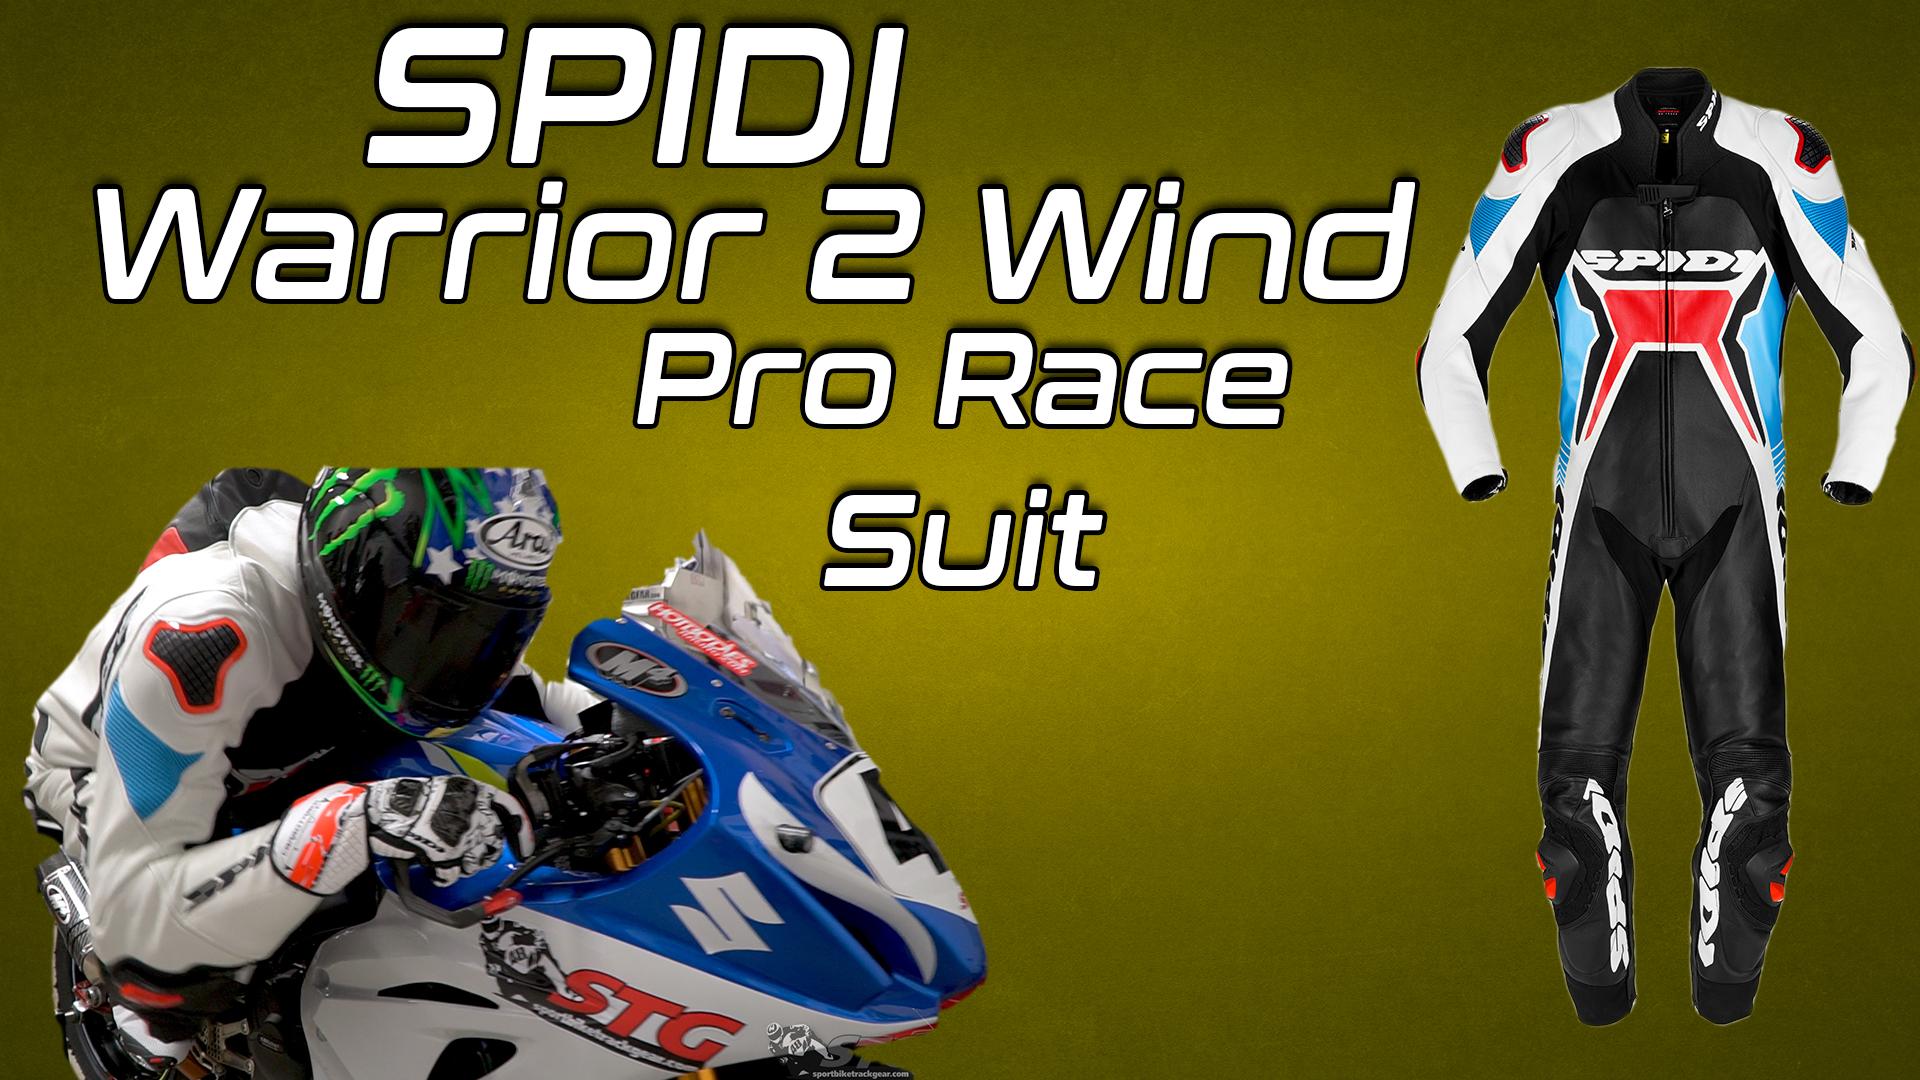 Spidi Warrior 2 Wind Pro Race Suit